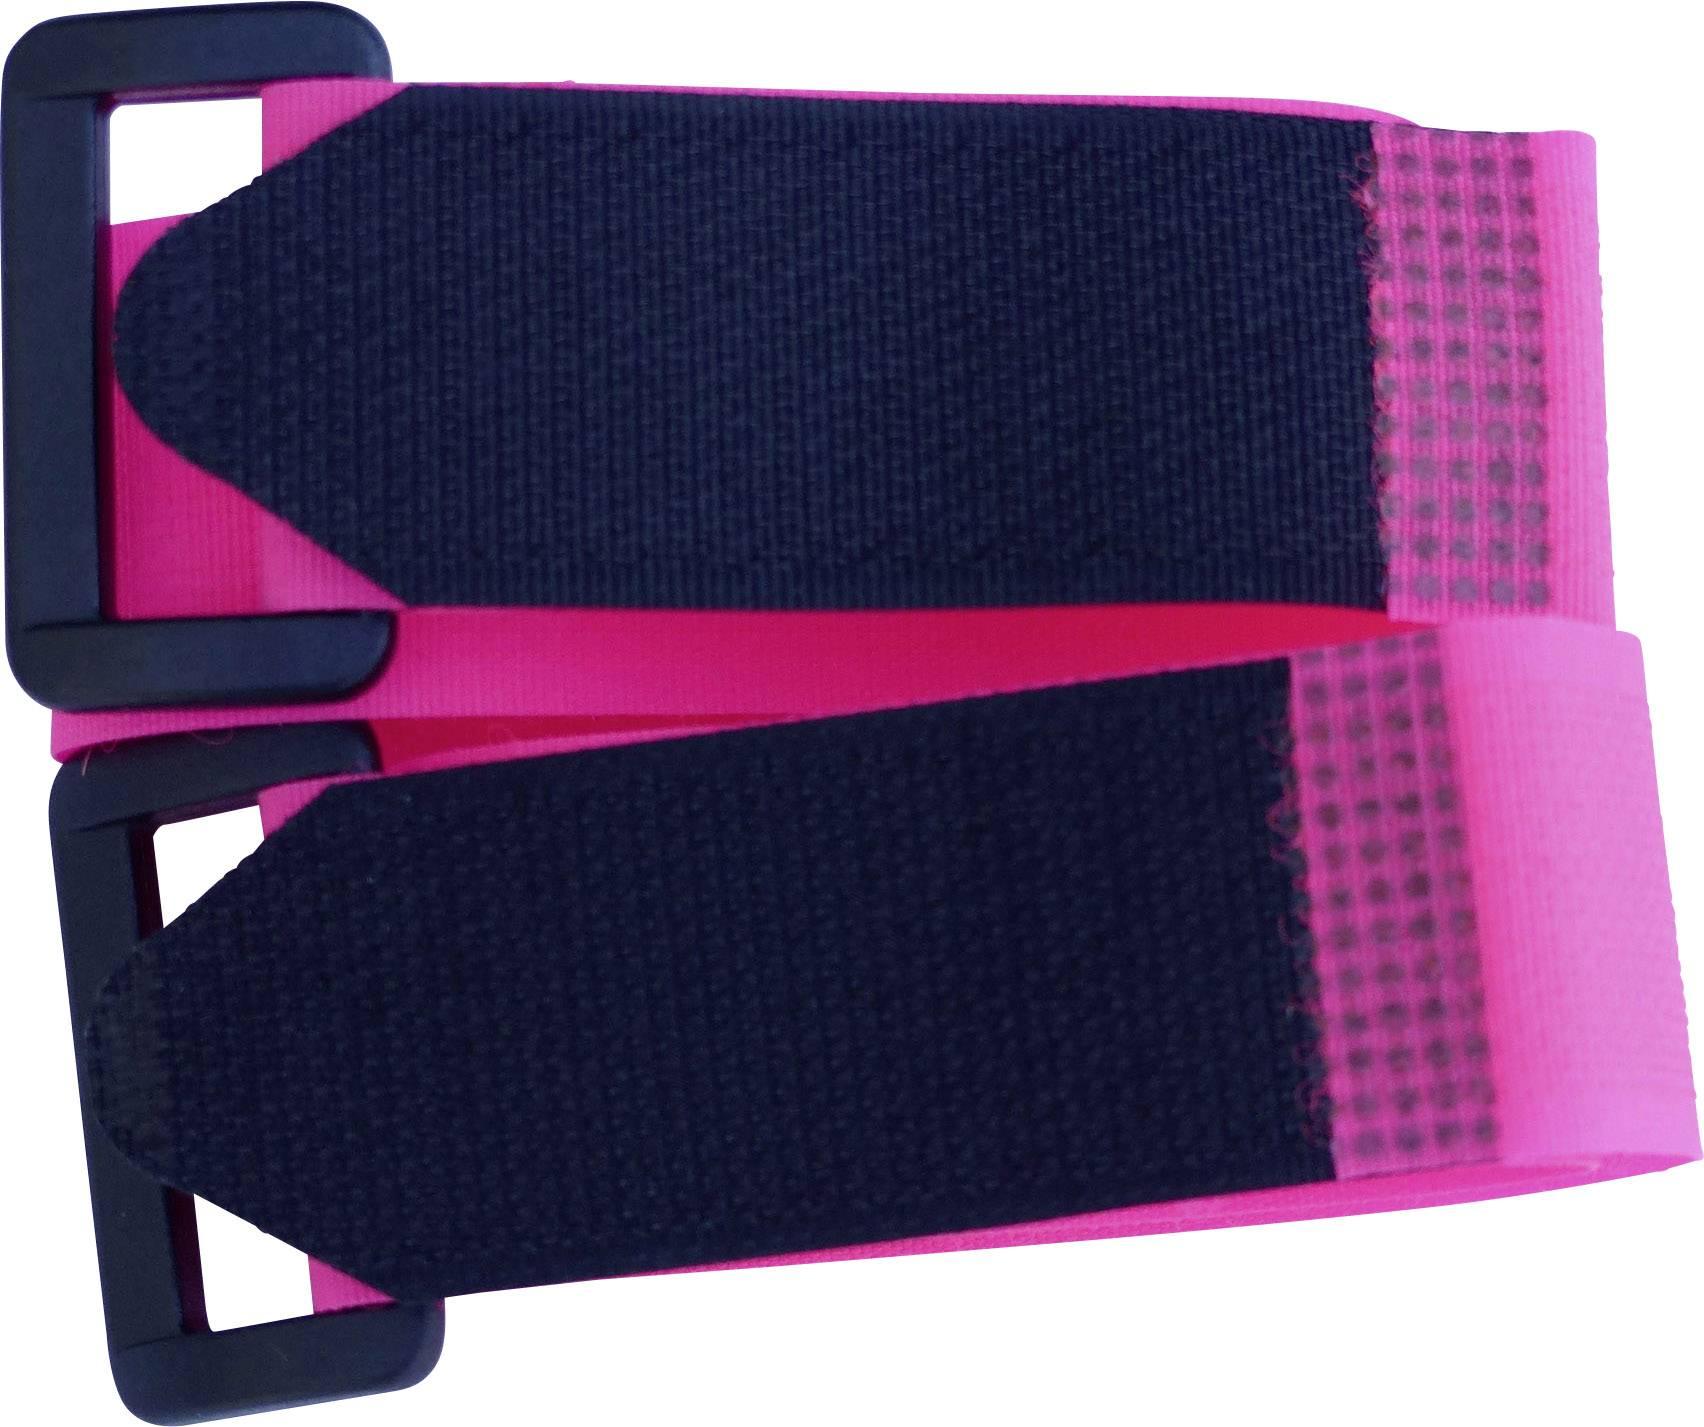 Pásek se suchým zipem TRU COMPONENTS 688-454-Bag, (d x š) 300 mm x 25 mm, fialová, 2 ks